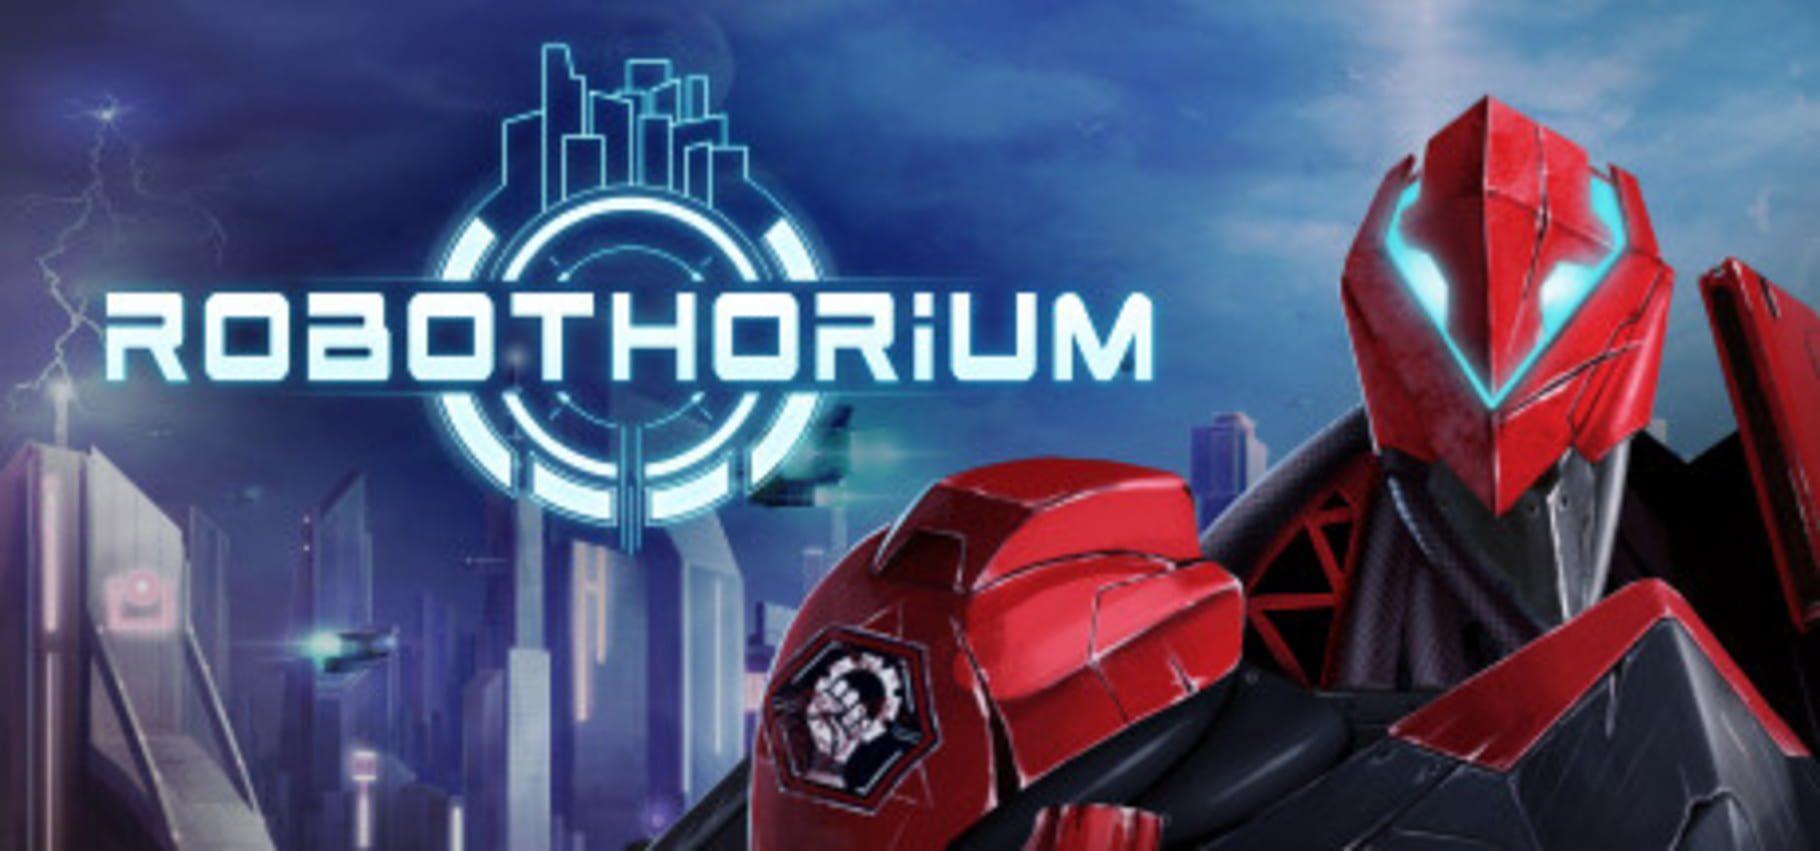 buy Robothorium cd key for all platform